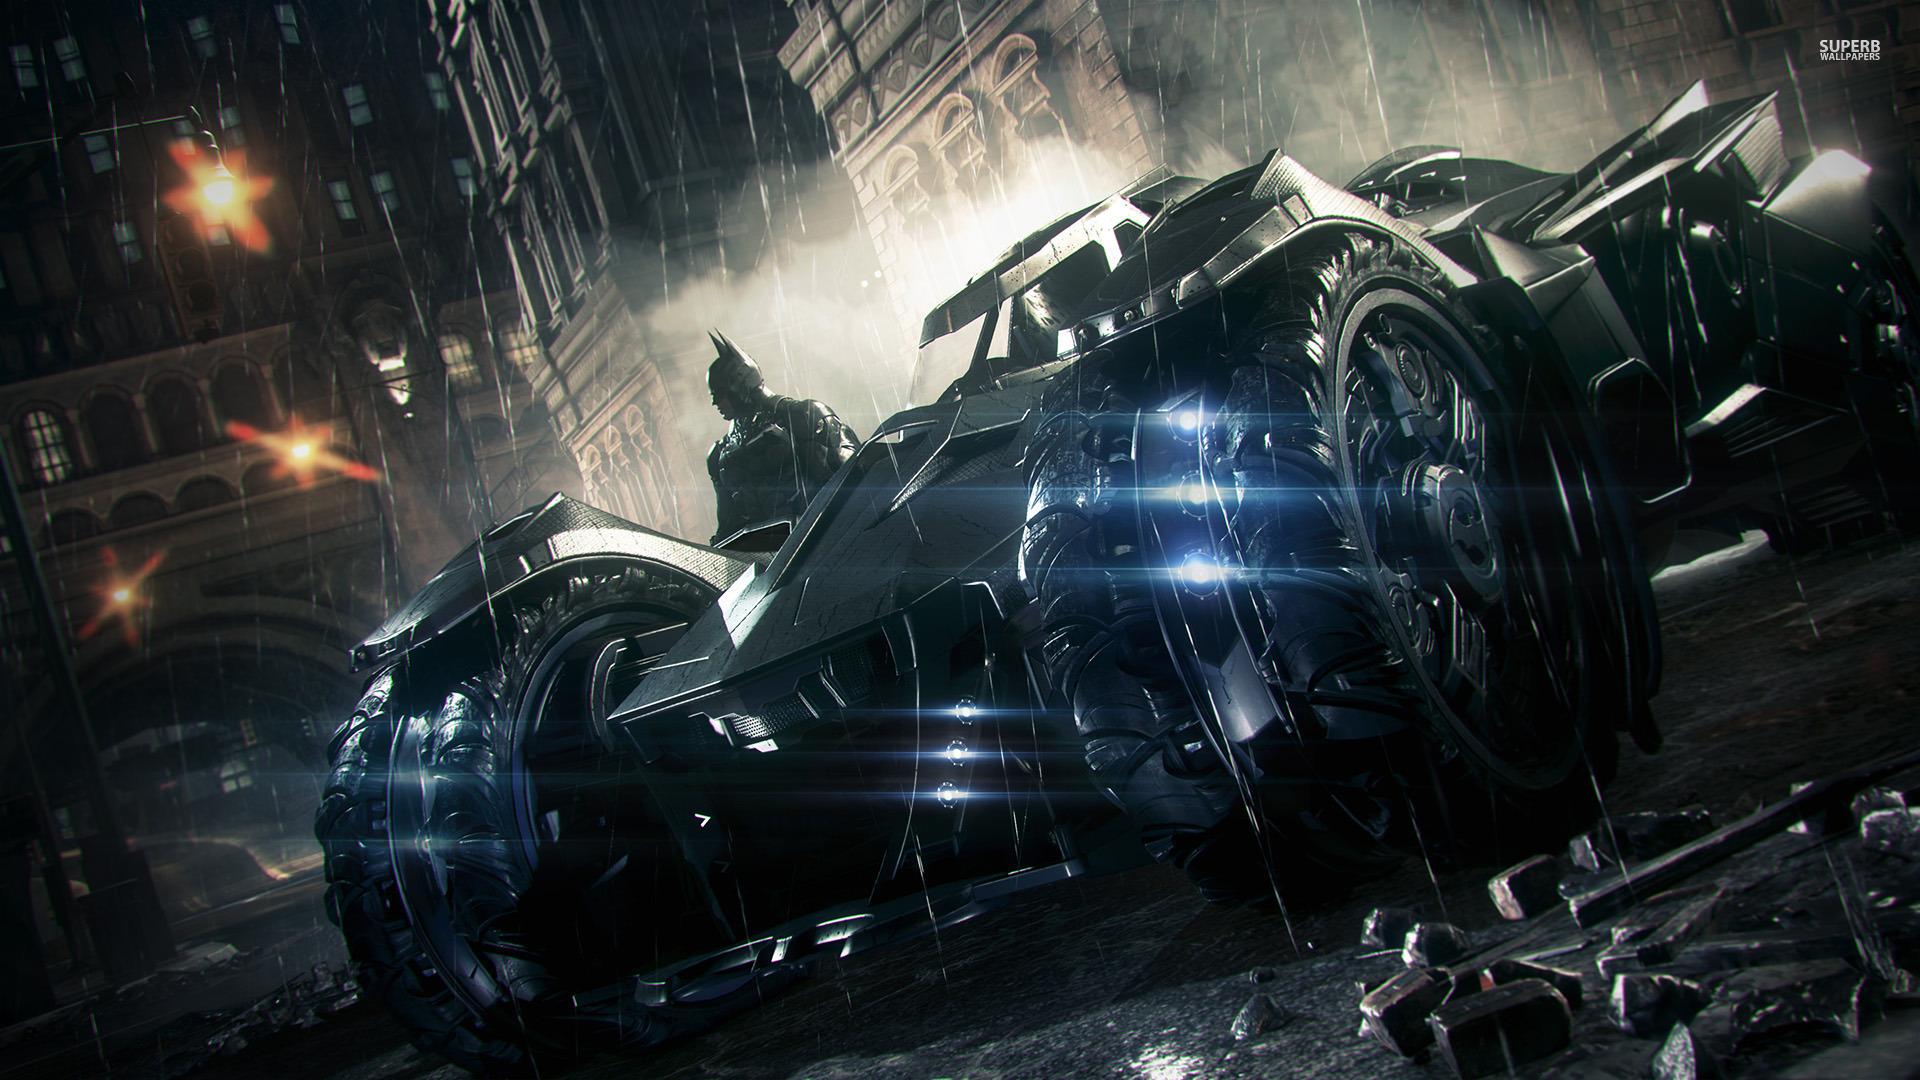 Batman Arkham Knight Wallpaper HD 5061 - HD Wallpapers Site